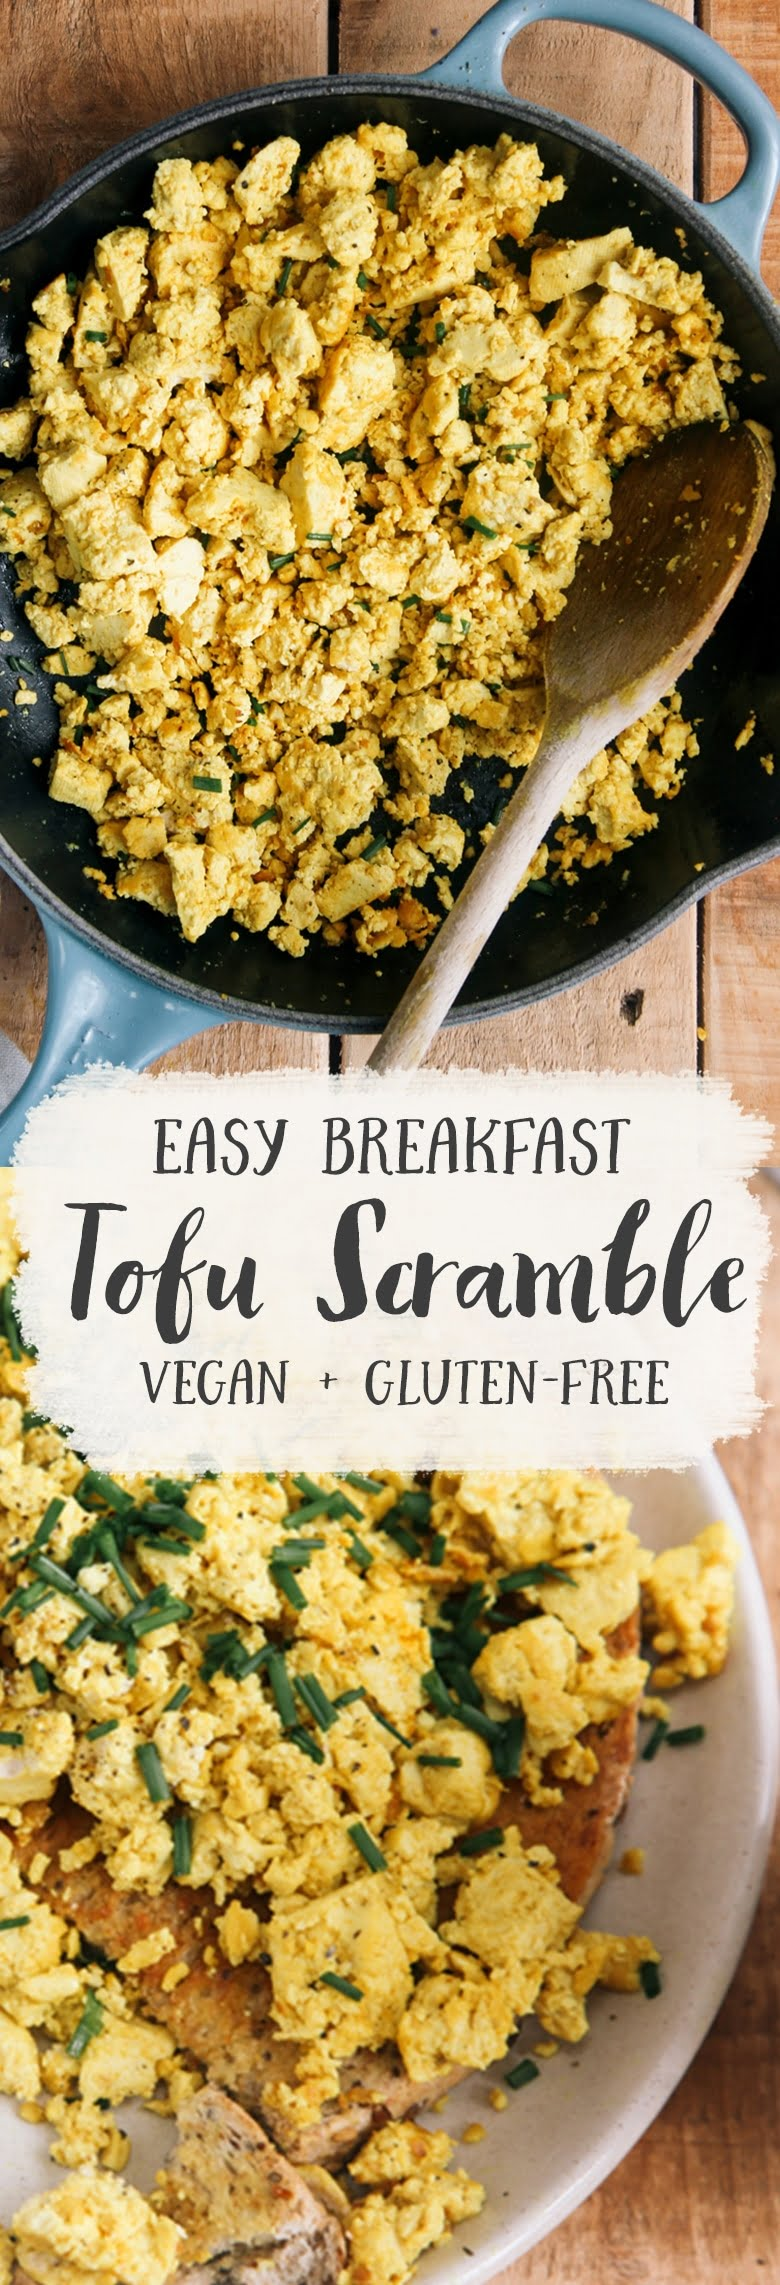 Tofu Breakfast Scramble #vegan #vegetarian #breakfast #glutenfree #grainfree